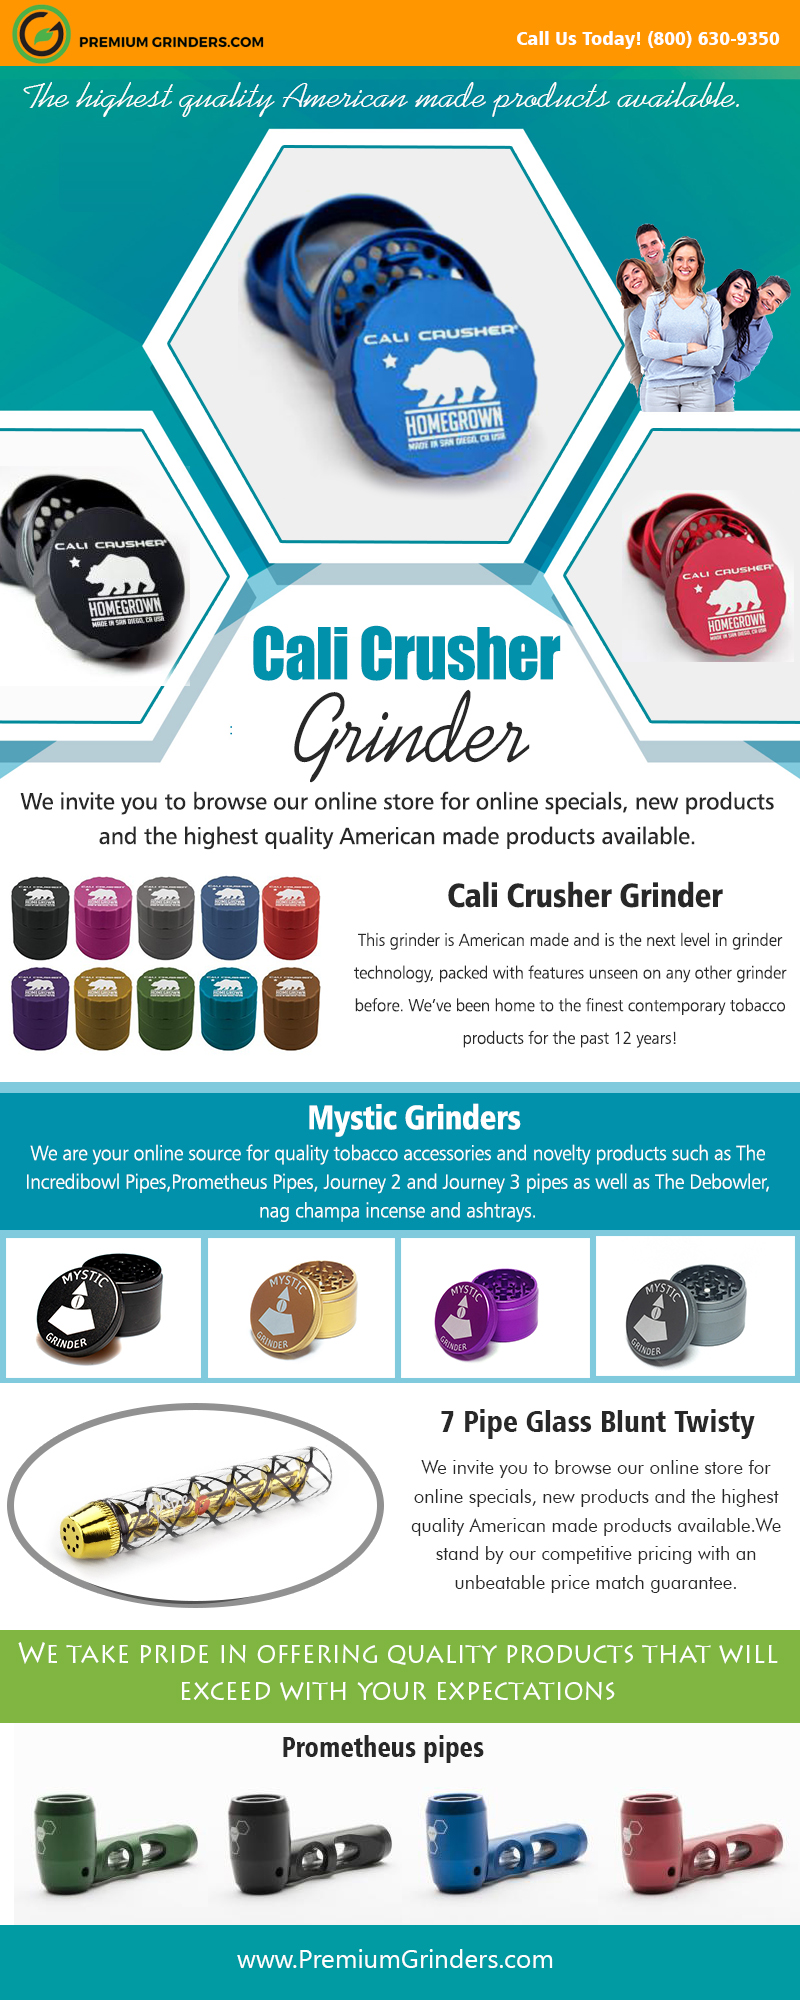 Cali Crusher Grinder   18006309350   premiumgrinders.com